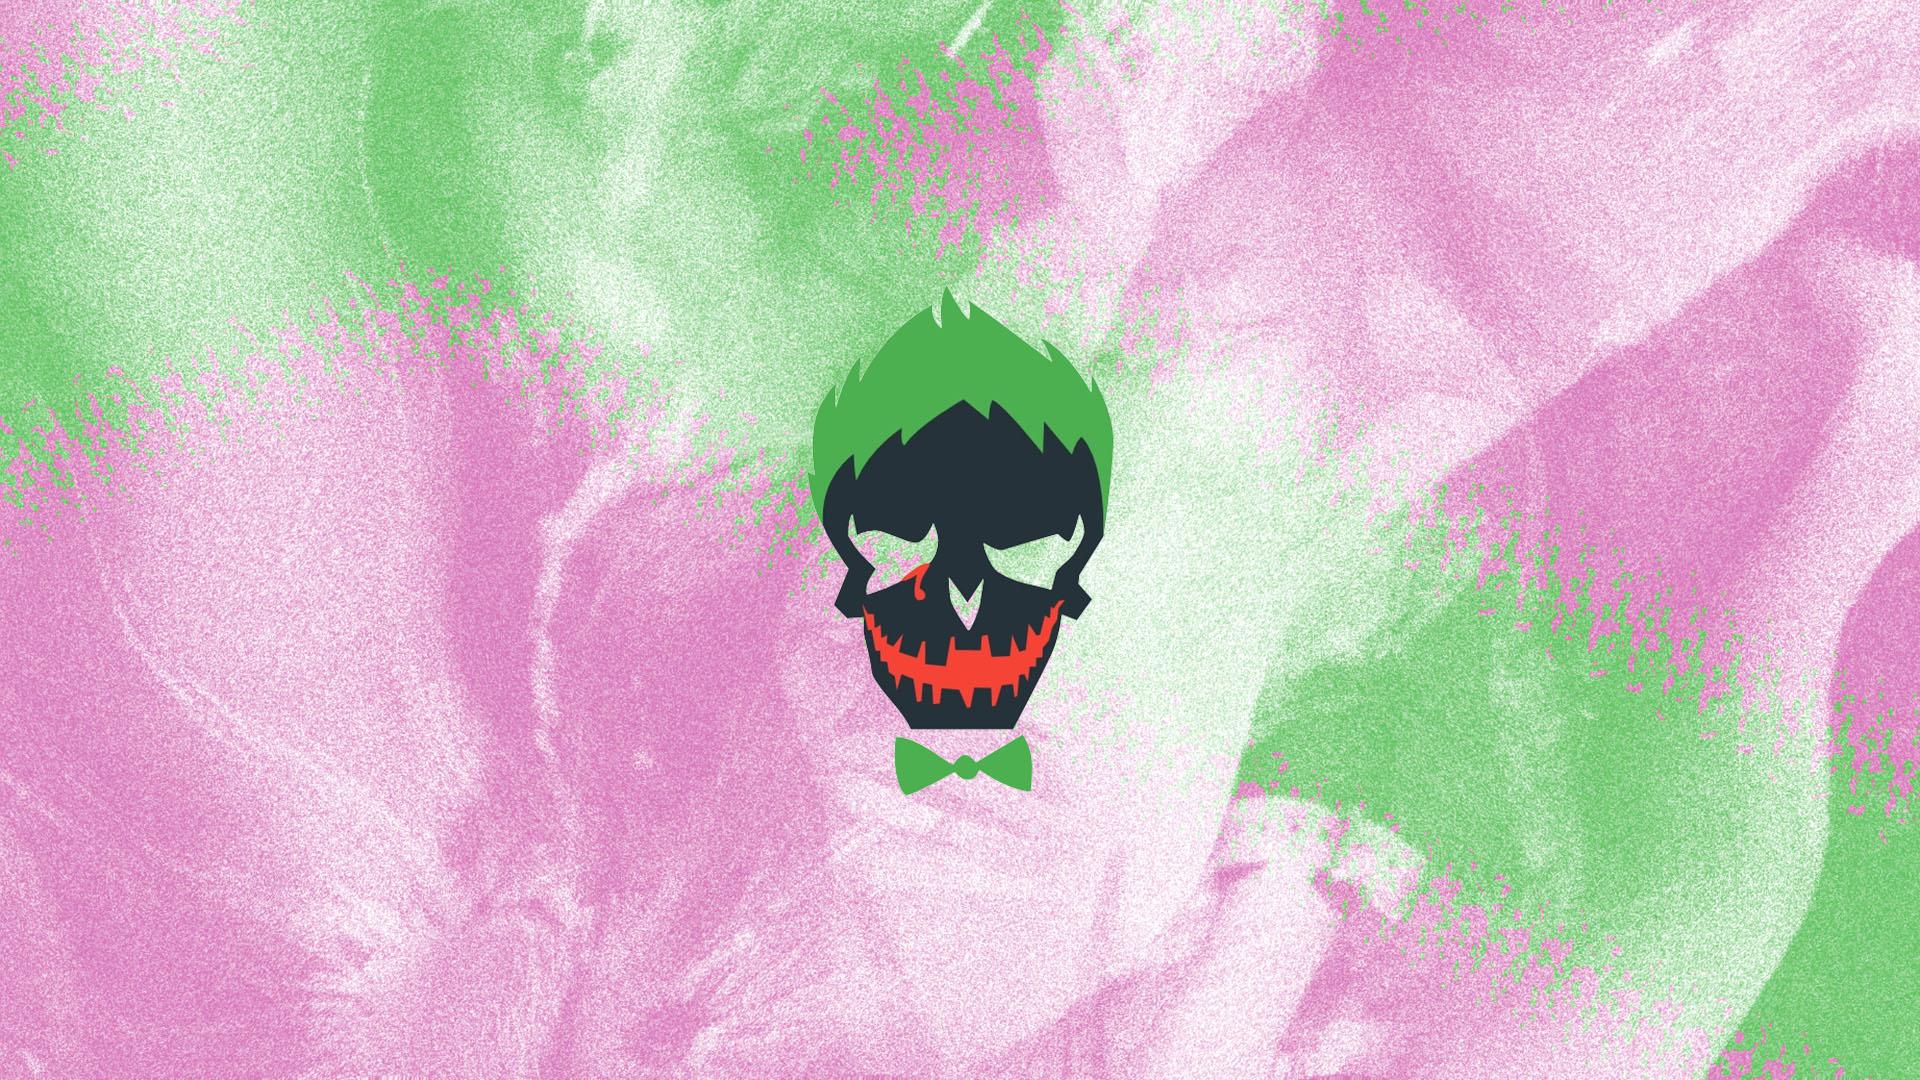 General 1920x1080 Suicide Squad DC Comics Joker Harley Quinn